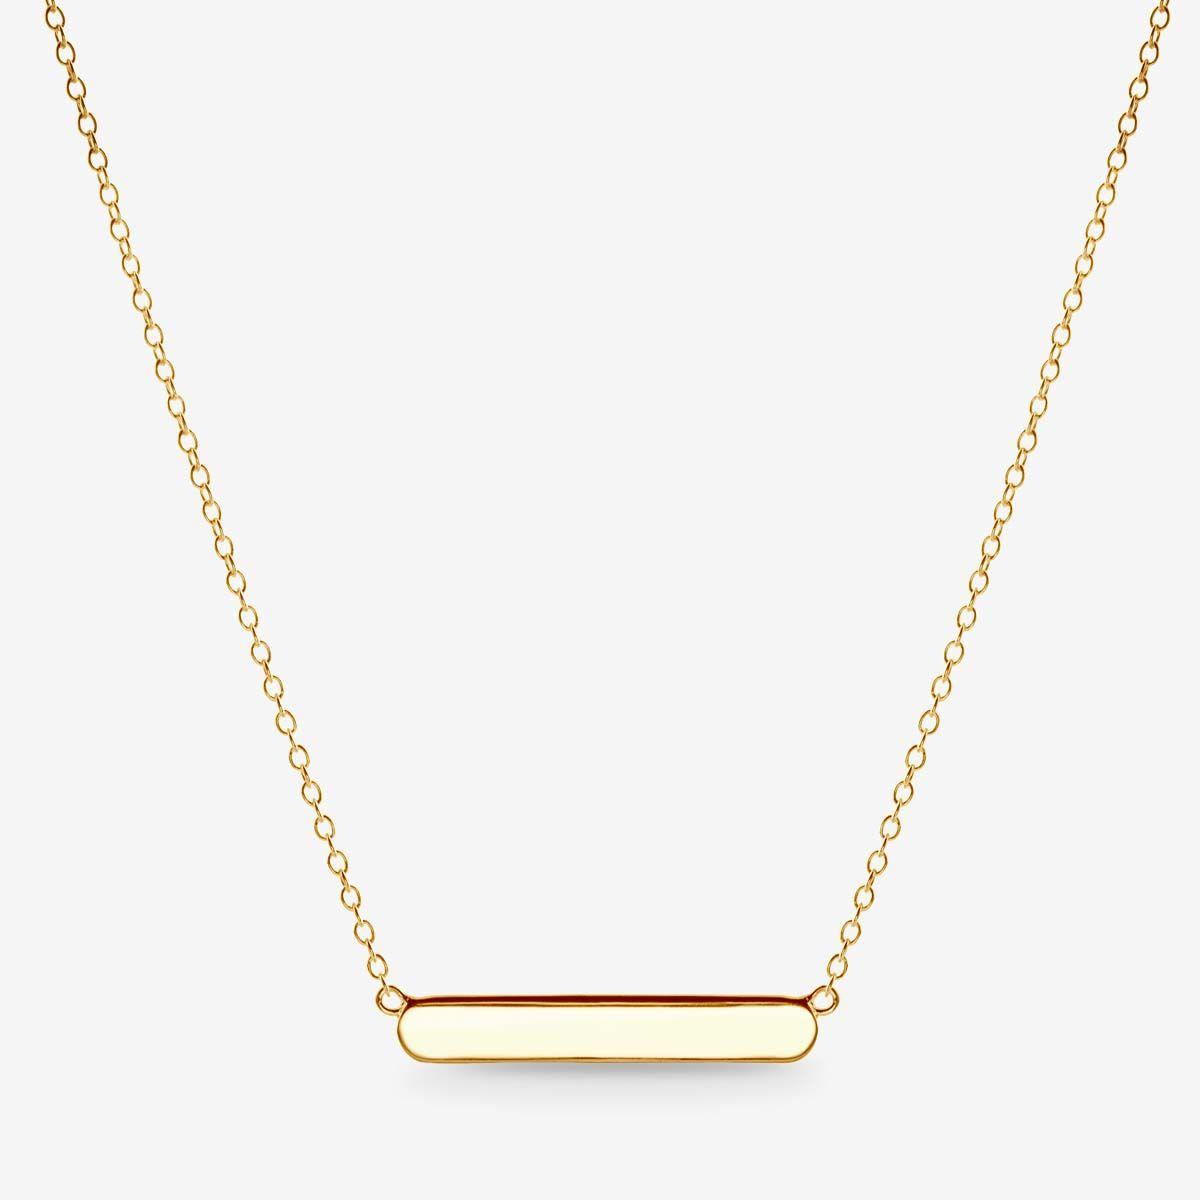 Zora - Halsketten - 18k vergoldet